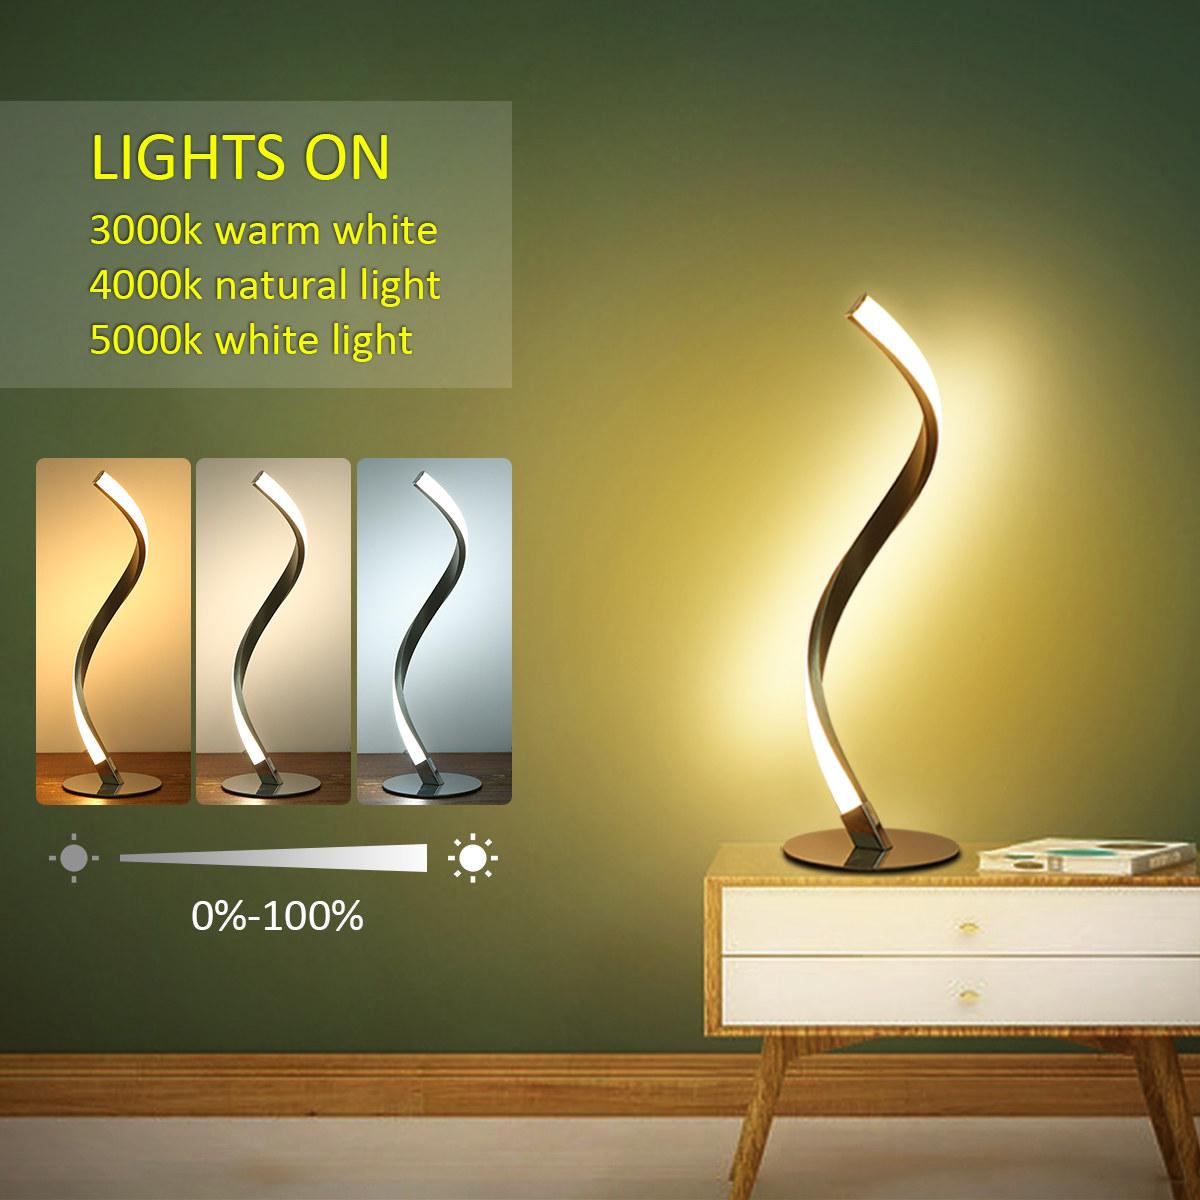 Tomshine 6w Spiral Led Table Light Dimmable 3 Lighting Colors Bedside Desk Lamp Nightstand Lamp For Bedroom Living Room Office